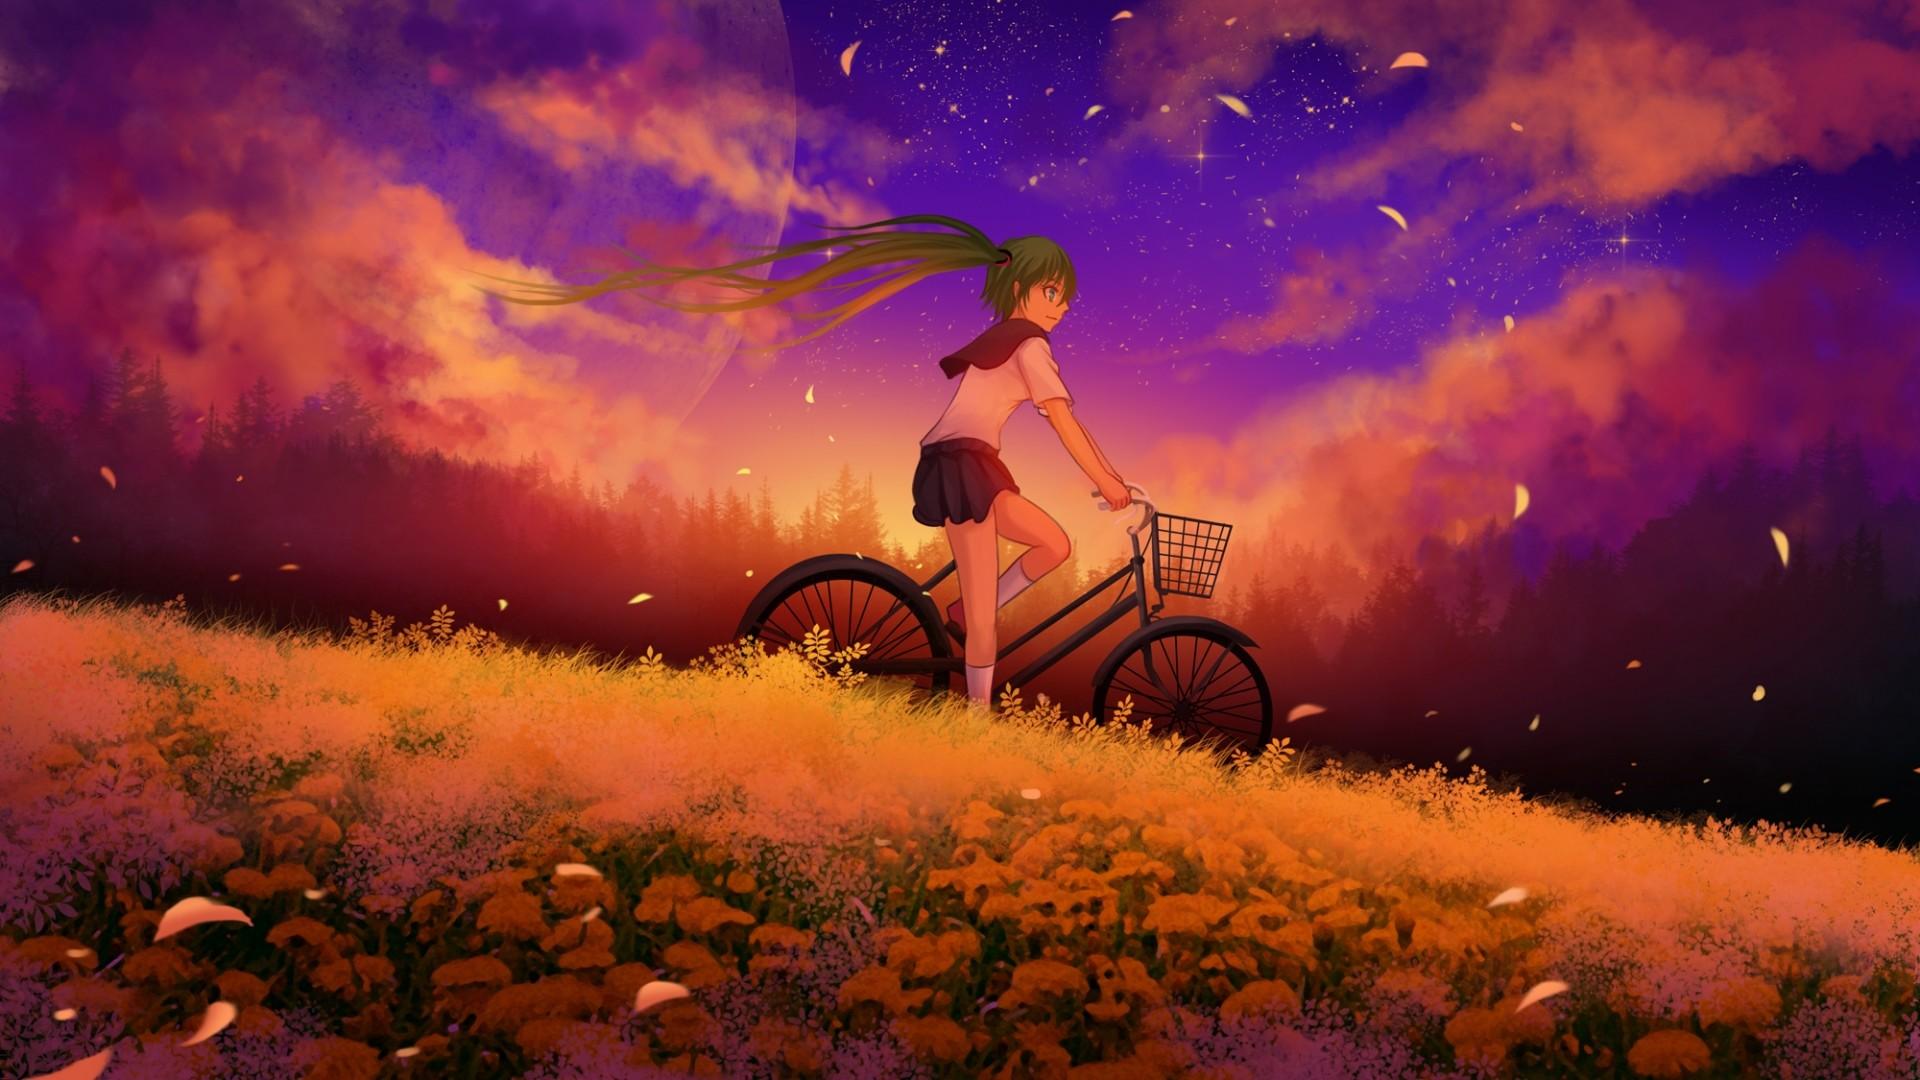 Wallpaper hatsune miku, girl, vocaloid, bike